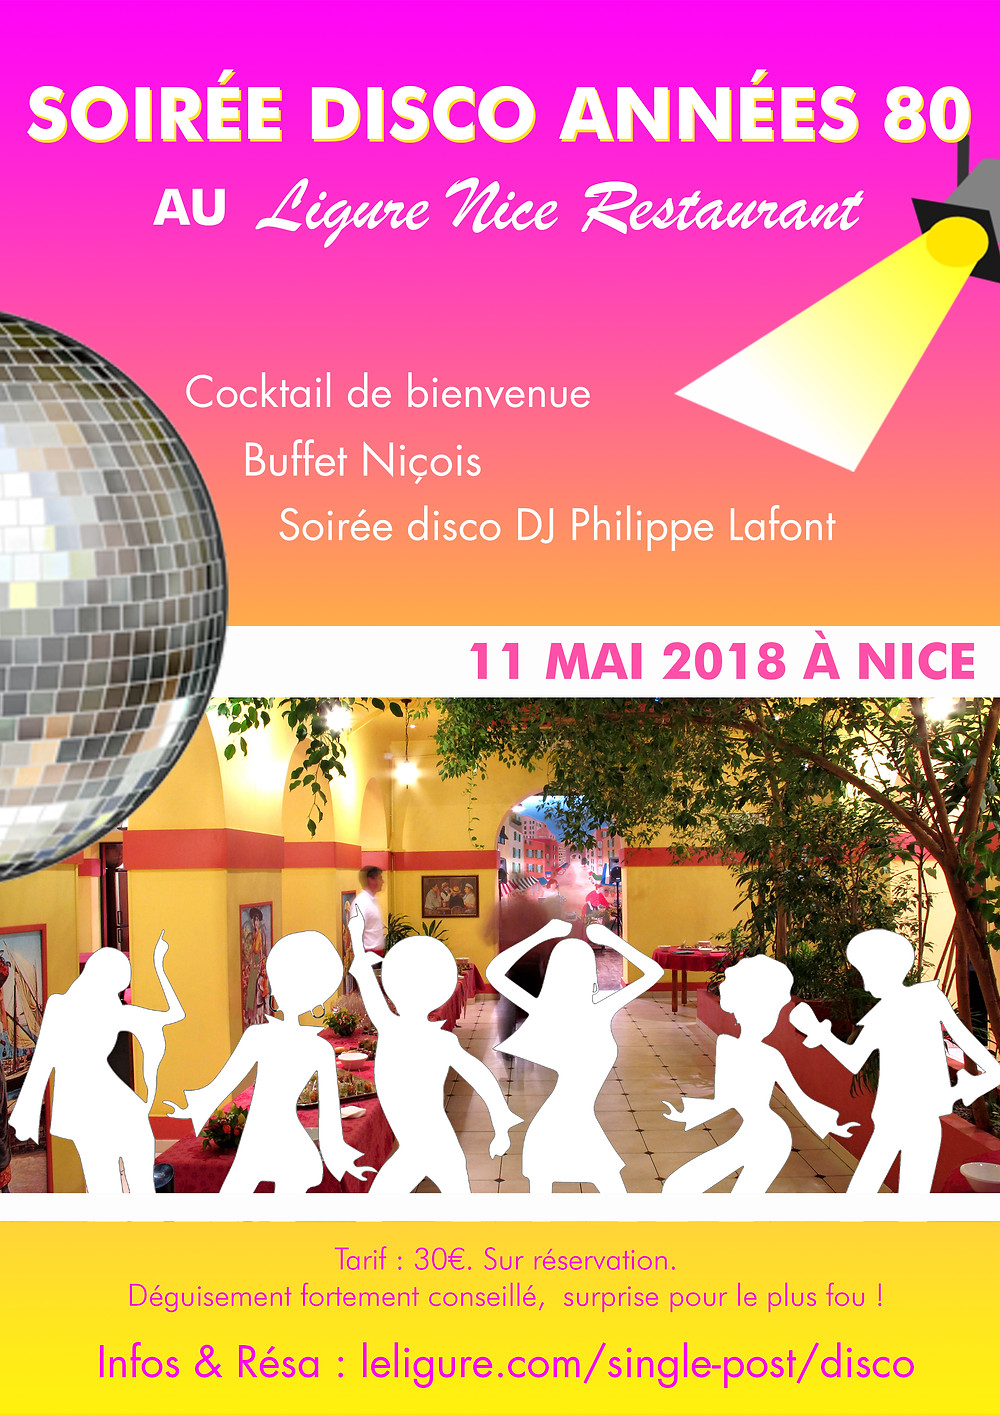 11 mai 2018 soiree disco annees 80 ligure nice restaurant